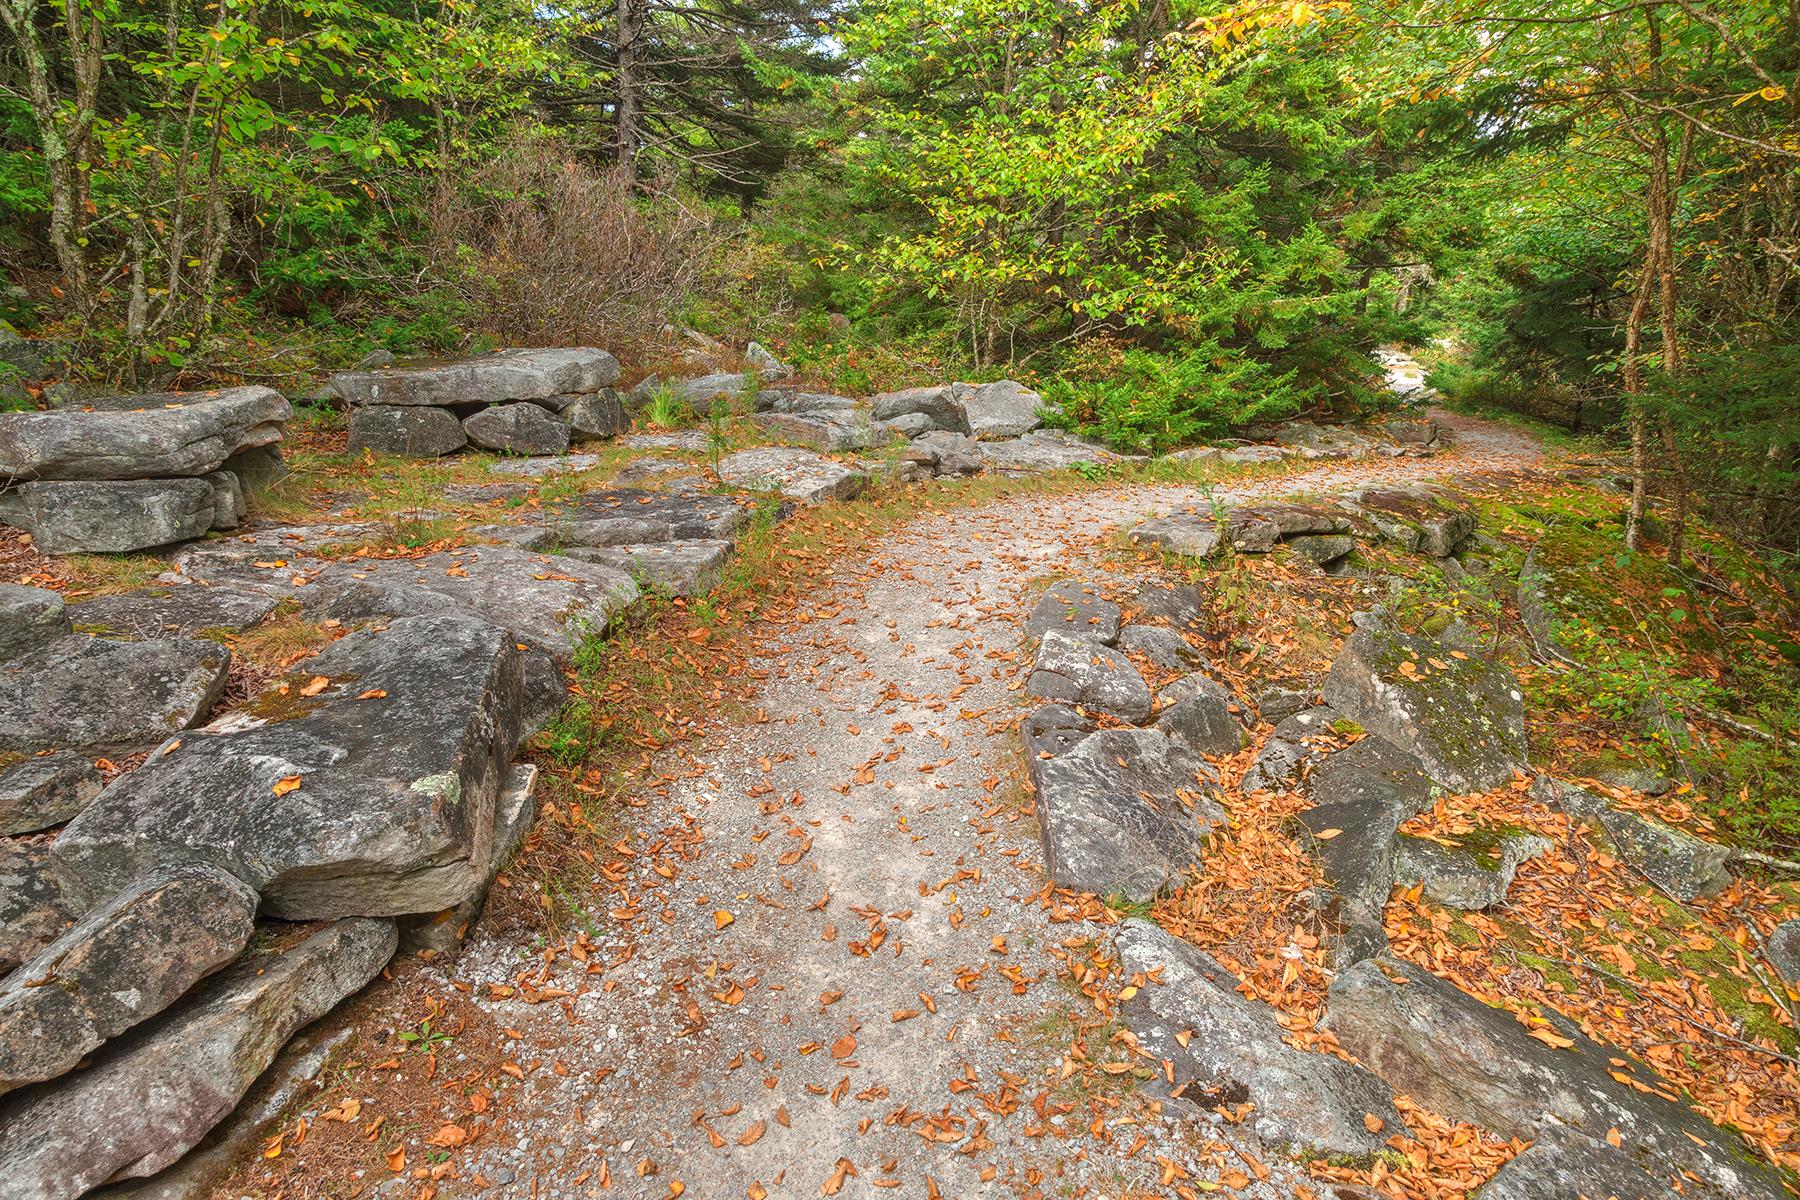 Spruce Knob Autumn Rock Trail - HDR, Adventure, Quiet, Scenery, Scene, HQ Photo